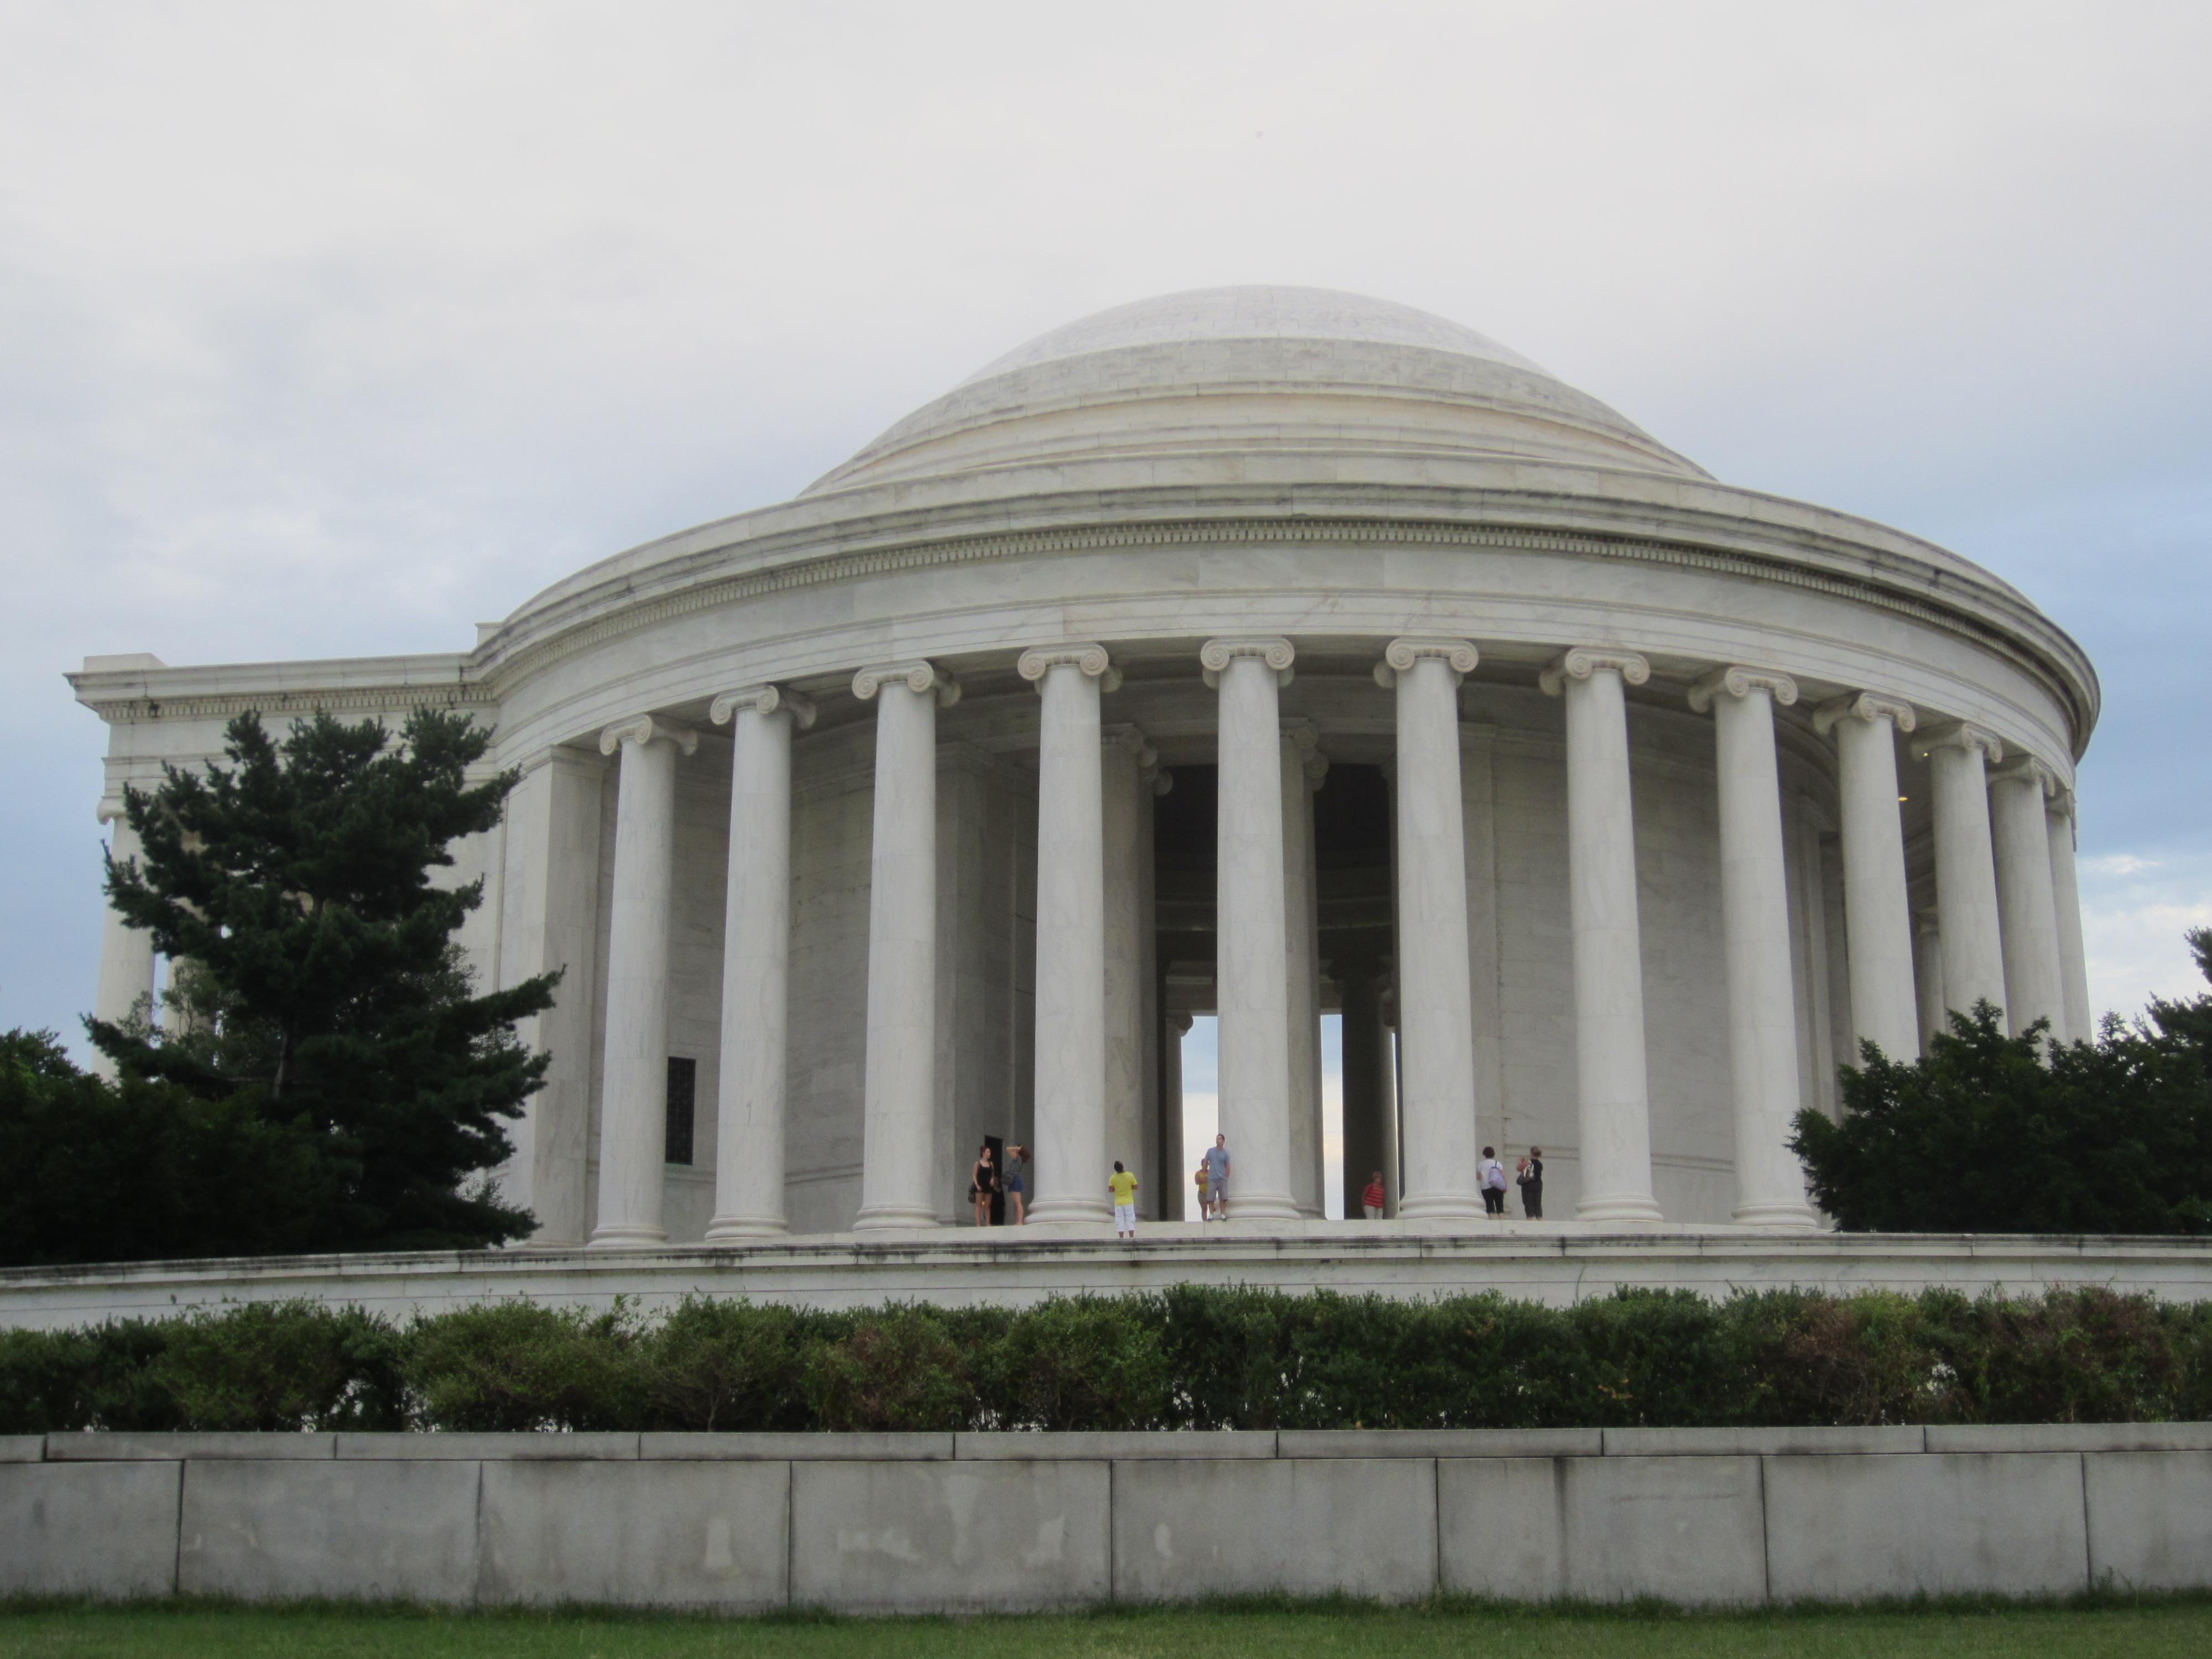 Jefferson Memorial Washington dc Memorial in Washington dc